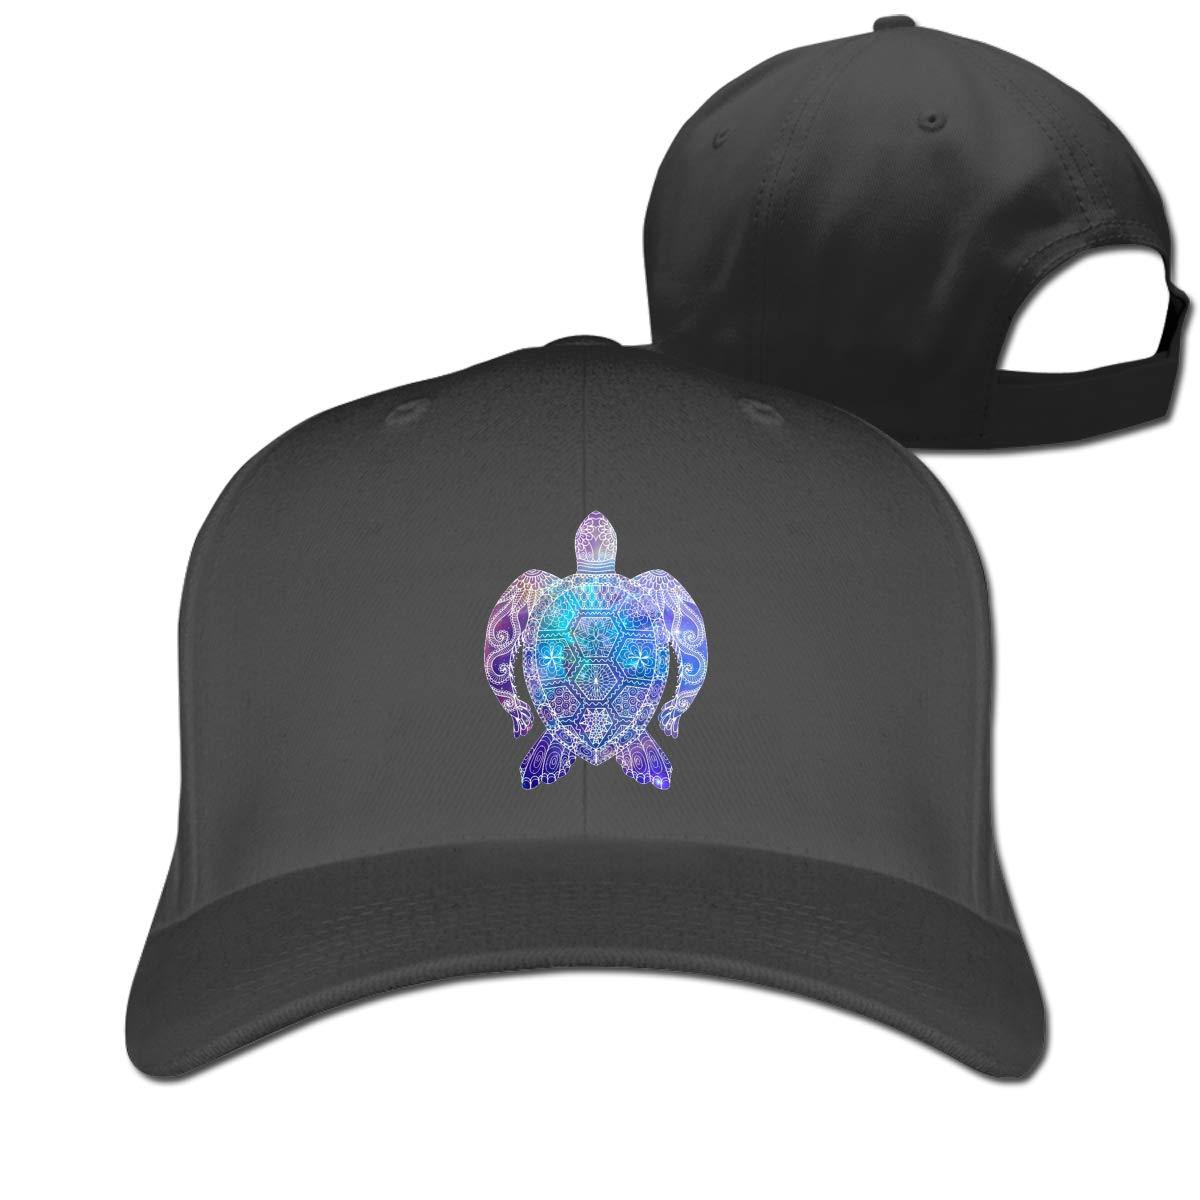 Space Sea Turtle Fashion Adjustable Cotton Baseball Caps Trucker Driver Hat Outdoor Cap Black